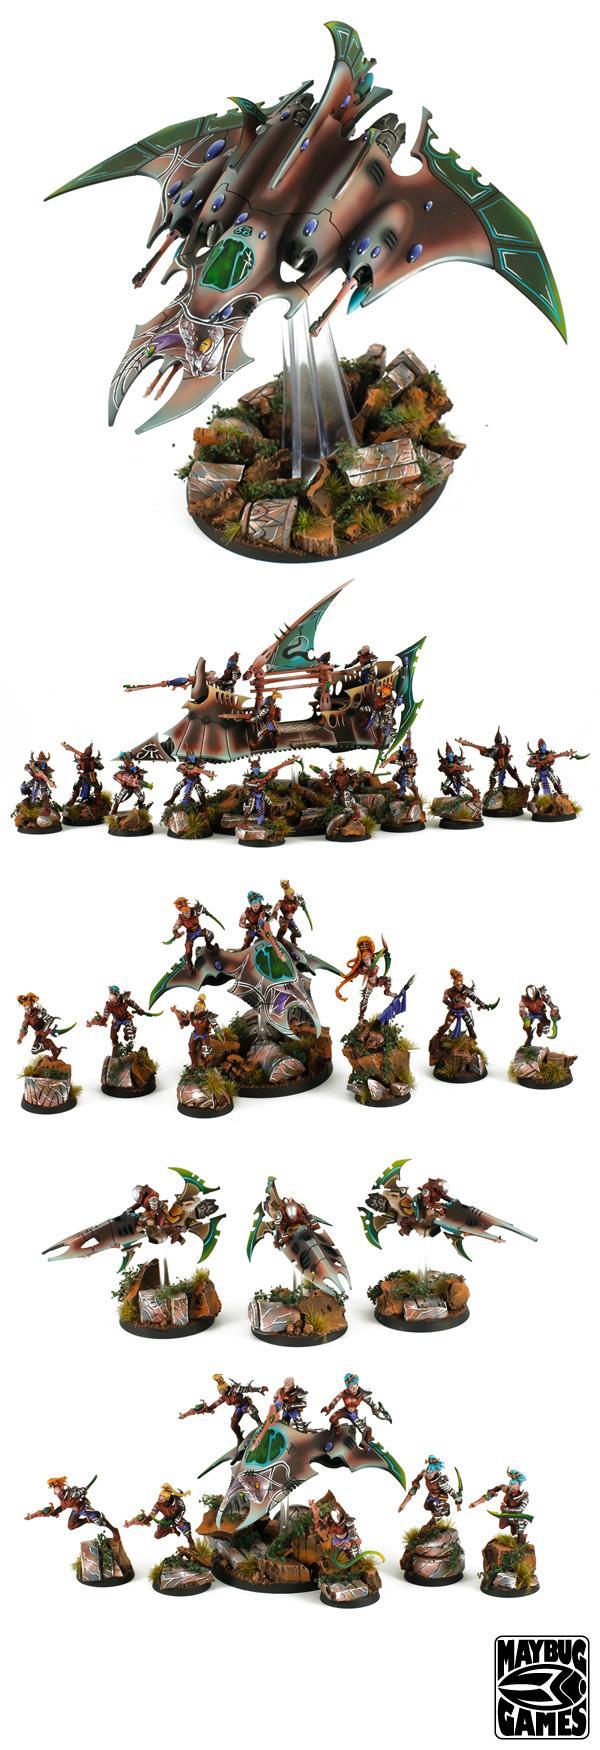 Blending, Commission, Cool Stuff, Dark Eldar, Impressive, Jetbike, Razorwing, Warhammer 40,000